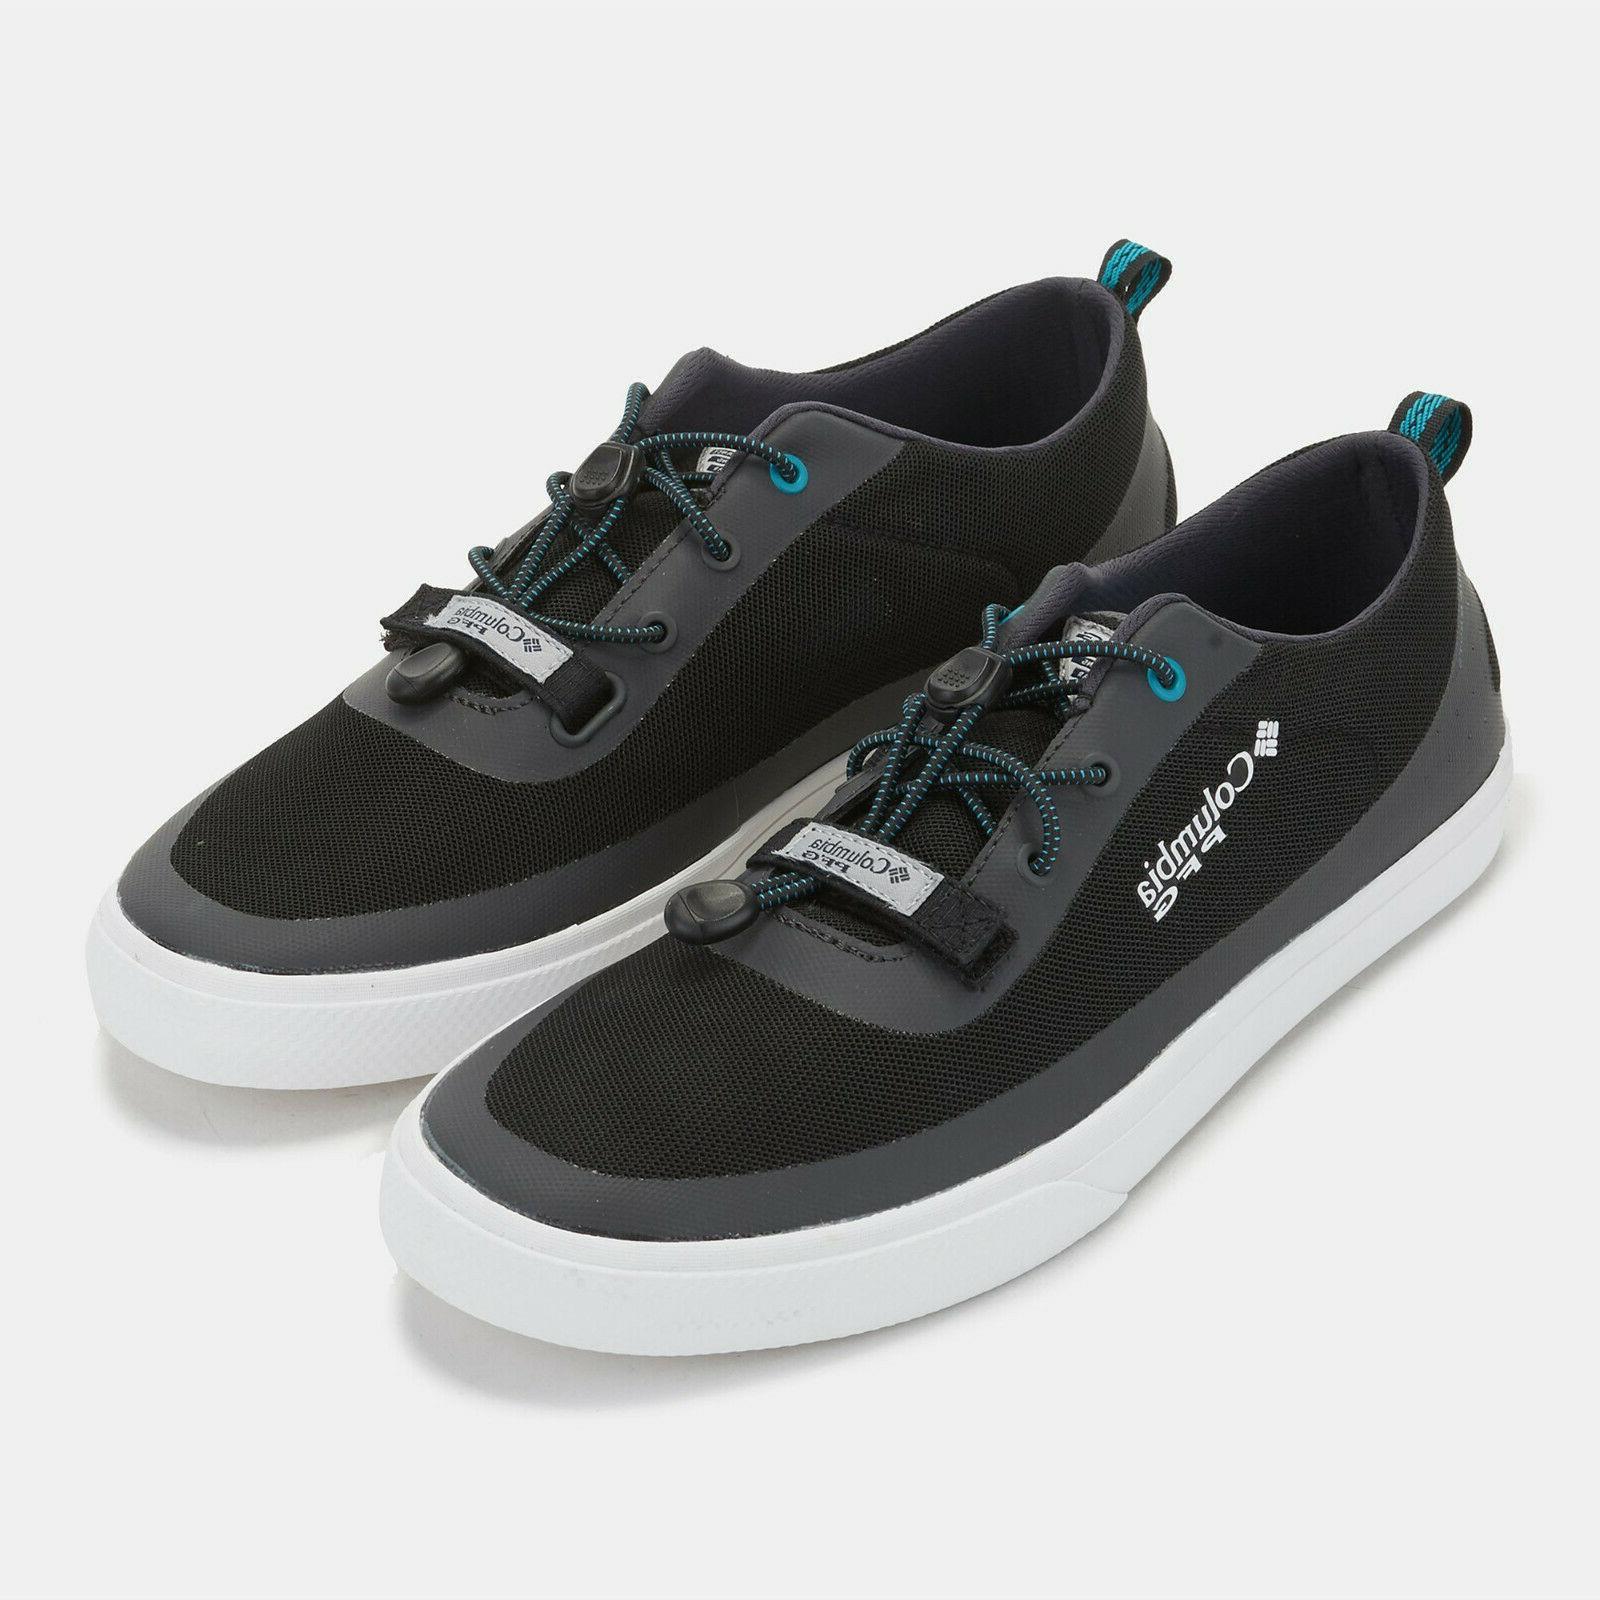 mens water shoes black dorado pfg cvo